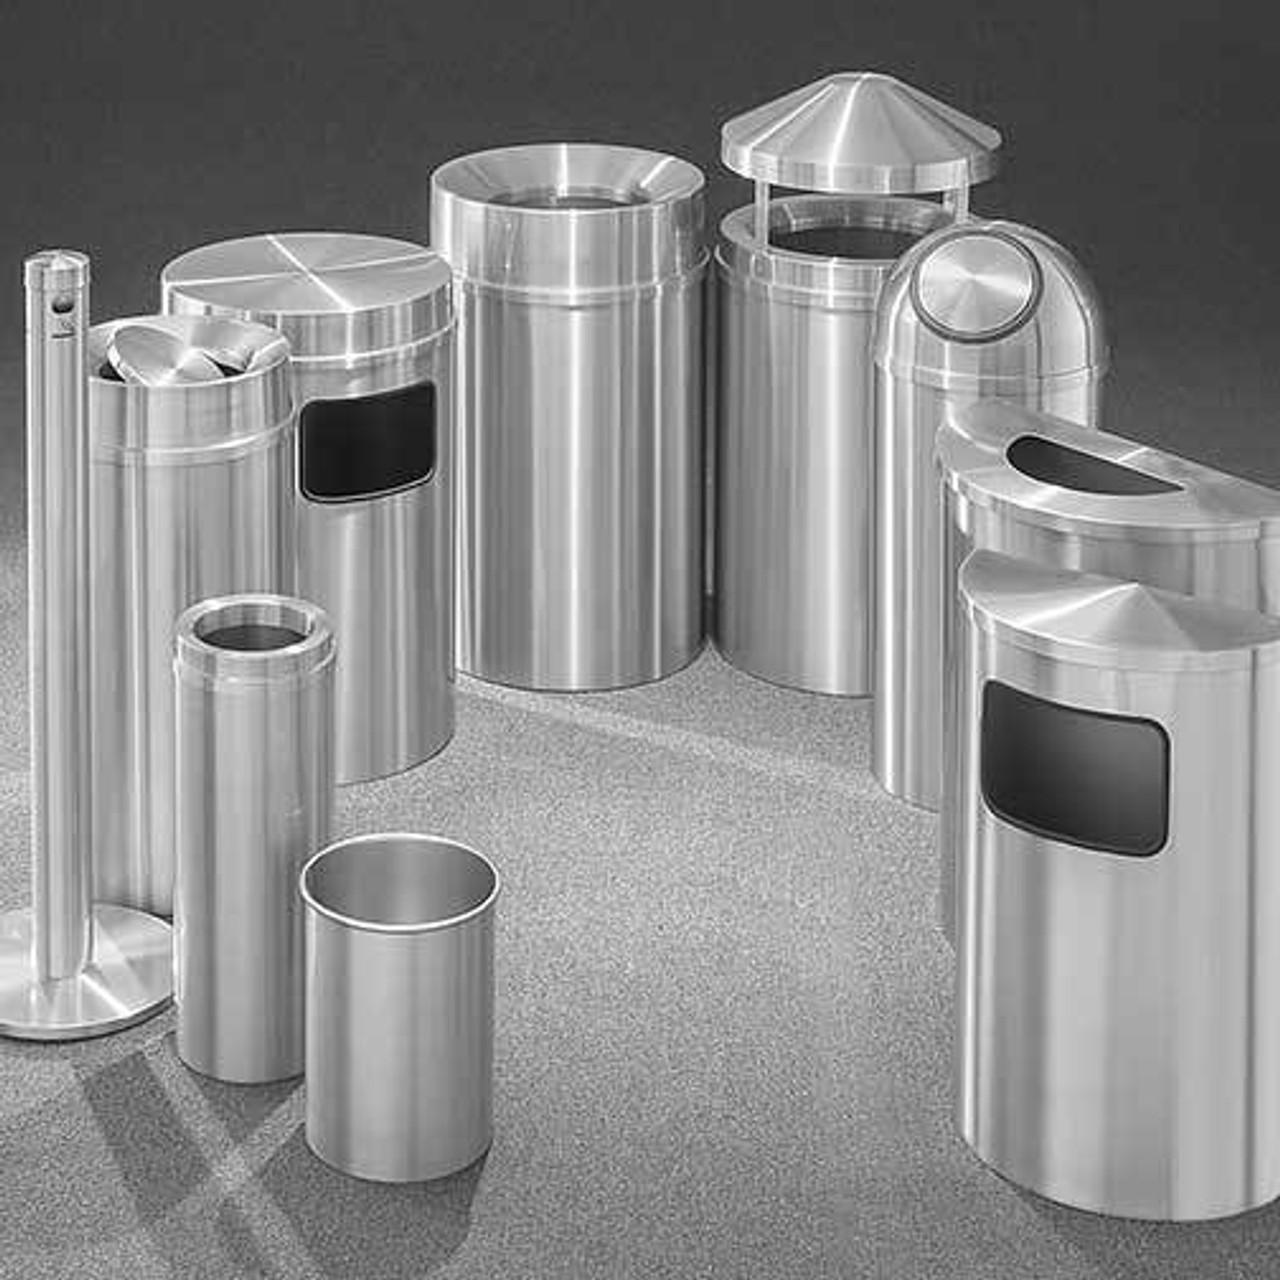 Glaro Waste Receptacles - New Yorker Series